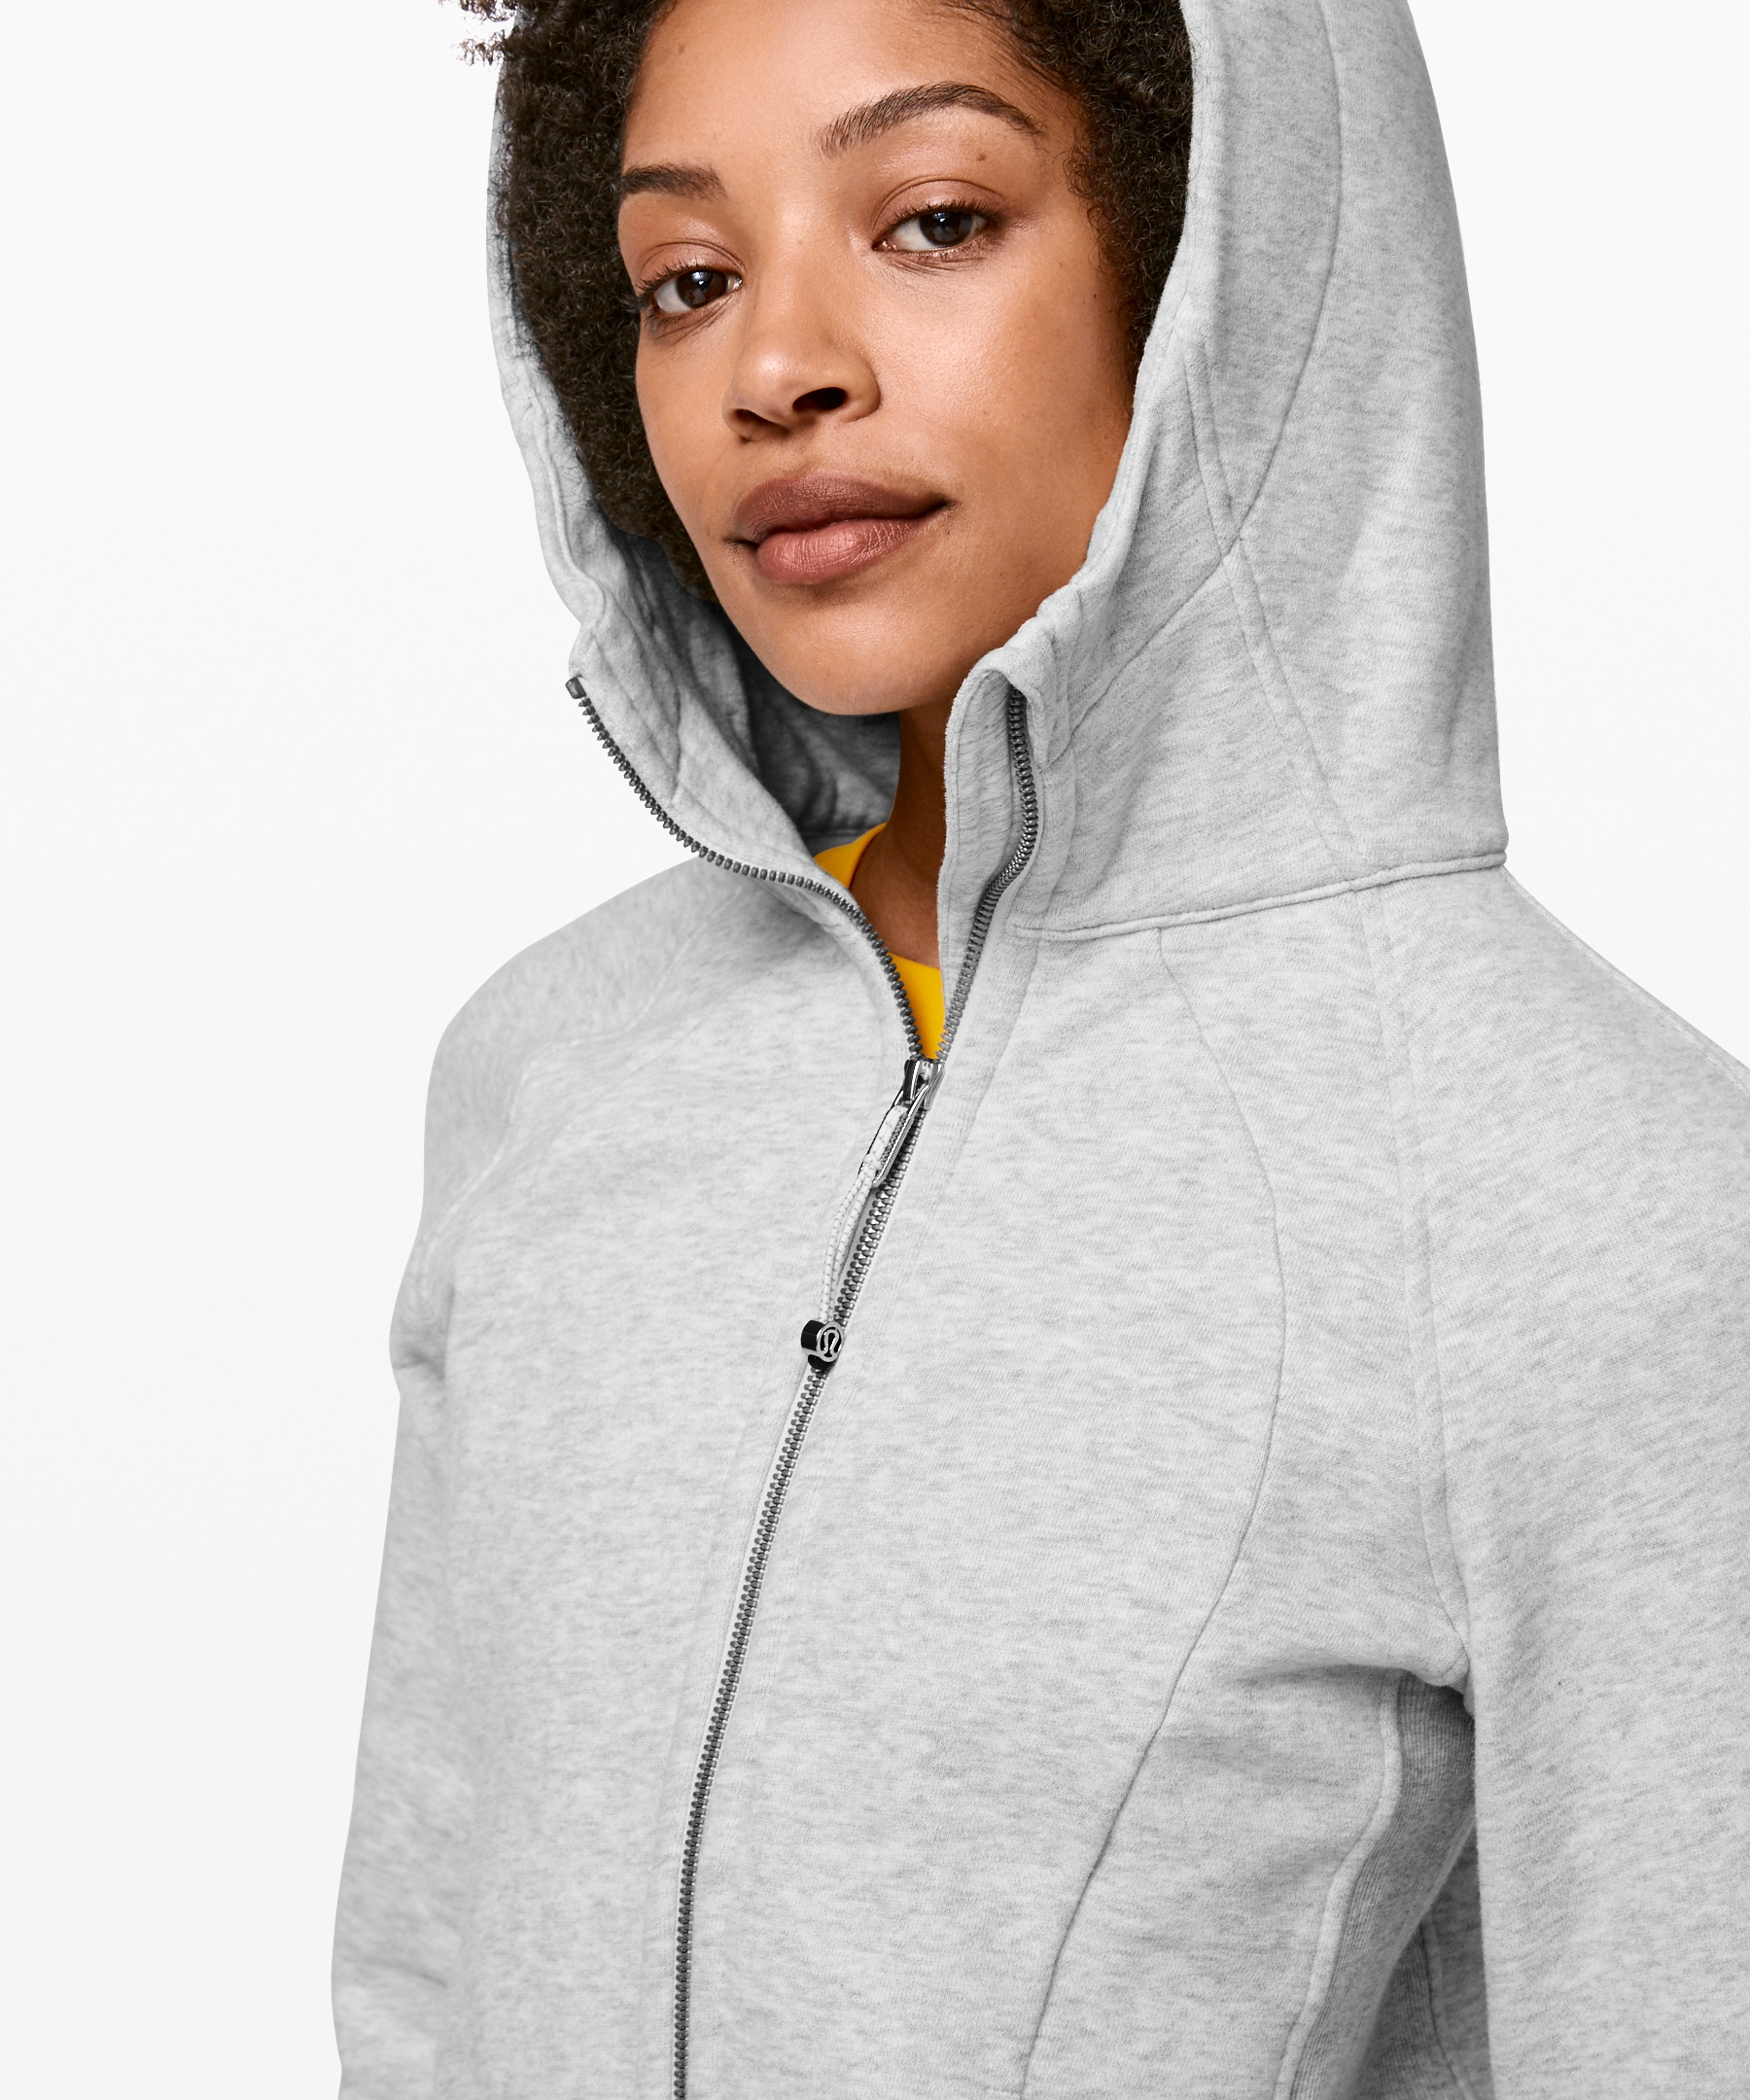 Lululemon Women S Scuba Hoodie Light Cotton Fleece Heathered Core Ultra Light Grey Size 8 Hoodies Cotton Fleece Cotton Lights